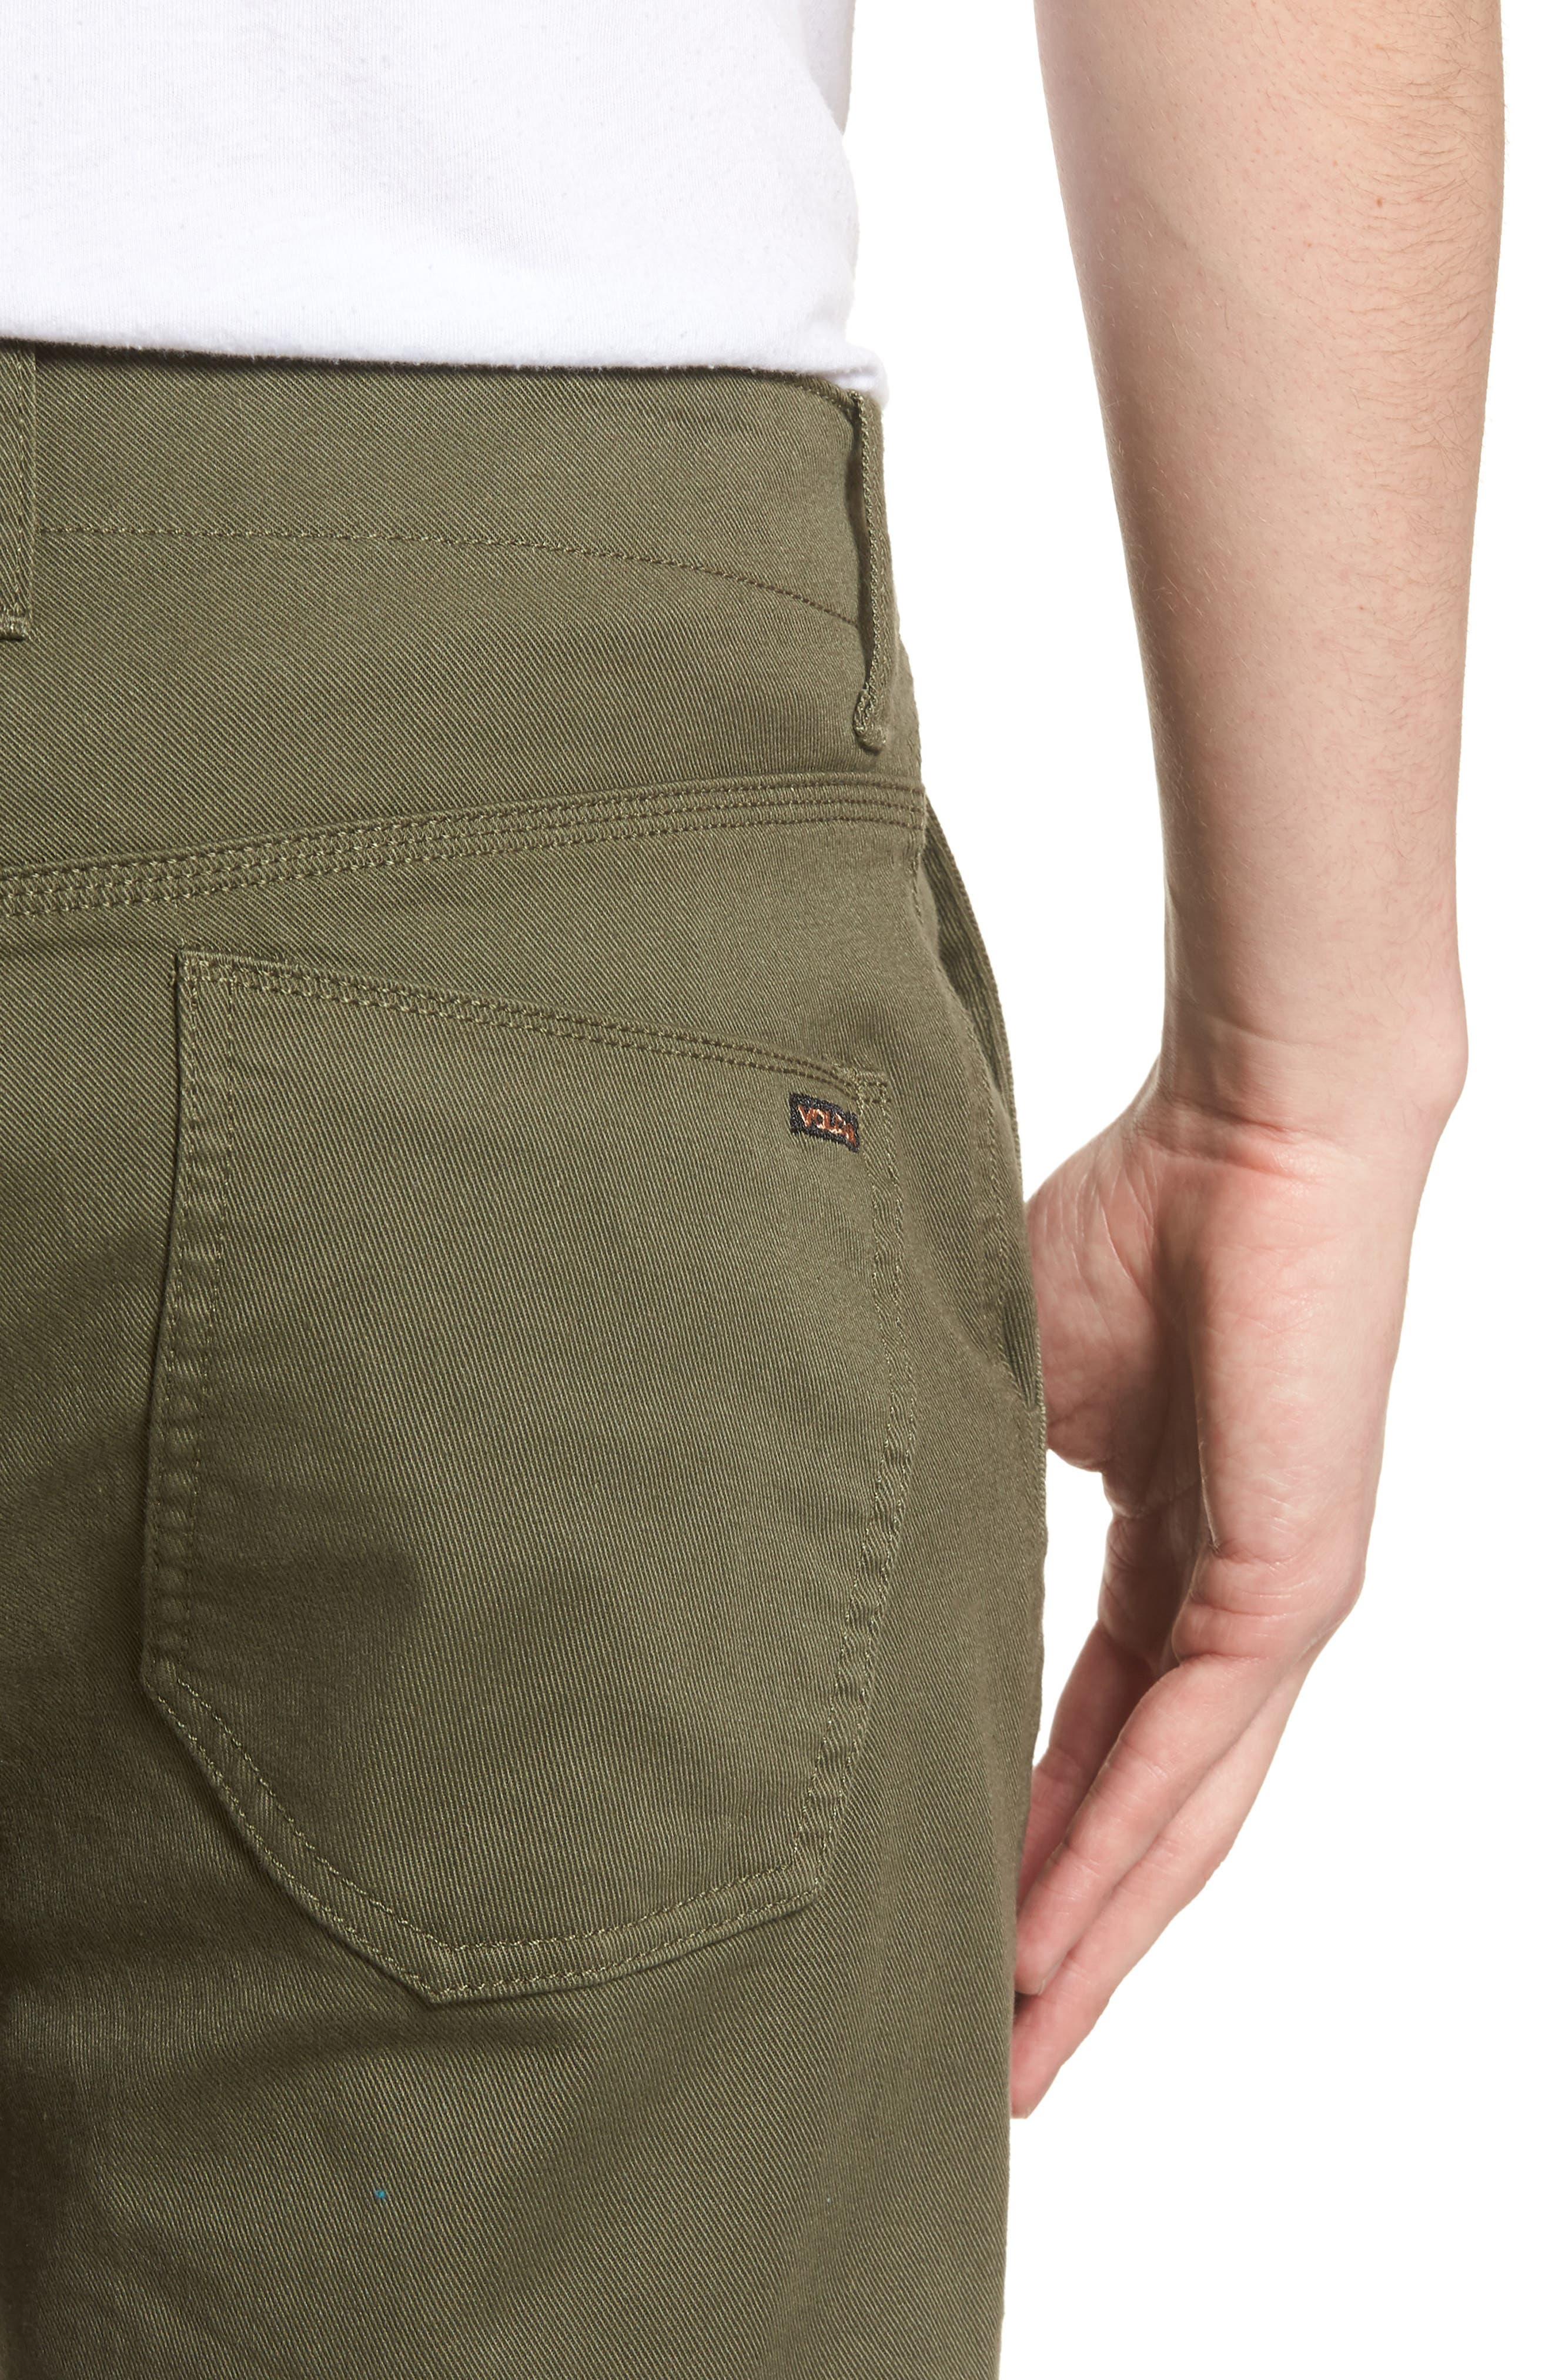 VSM Prowler Shorts,                             Alternate thumbnail 4, color,                             Military